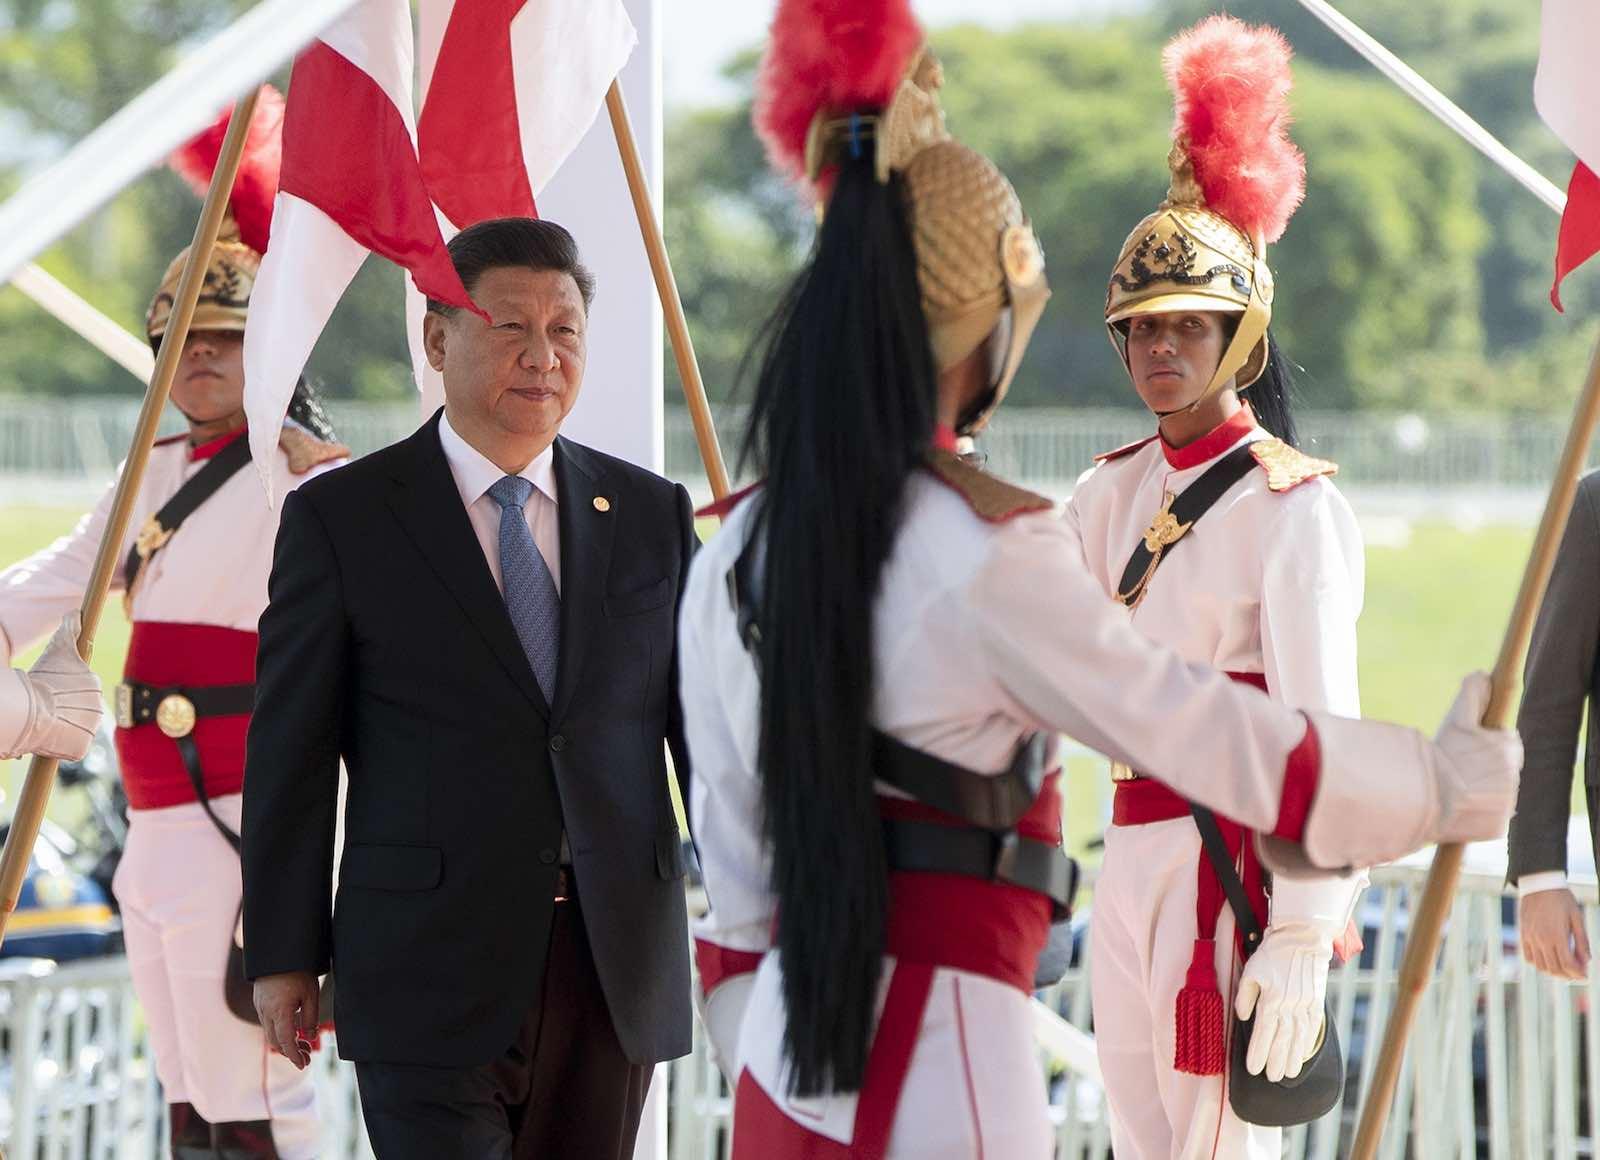 Chinese President Xi Jinping attending the BRICS summit in Brasilia, Brazil, October 2019 (Photo: Pavel Golovkin/AFP via Getty)